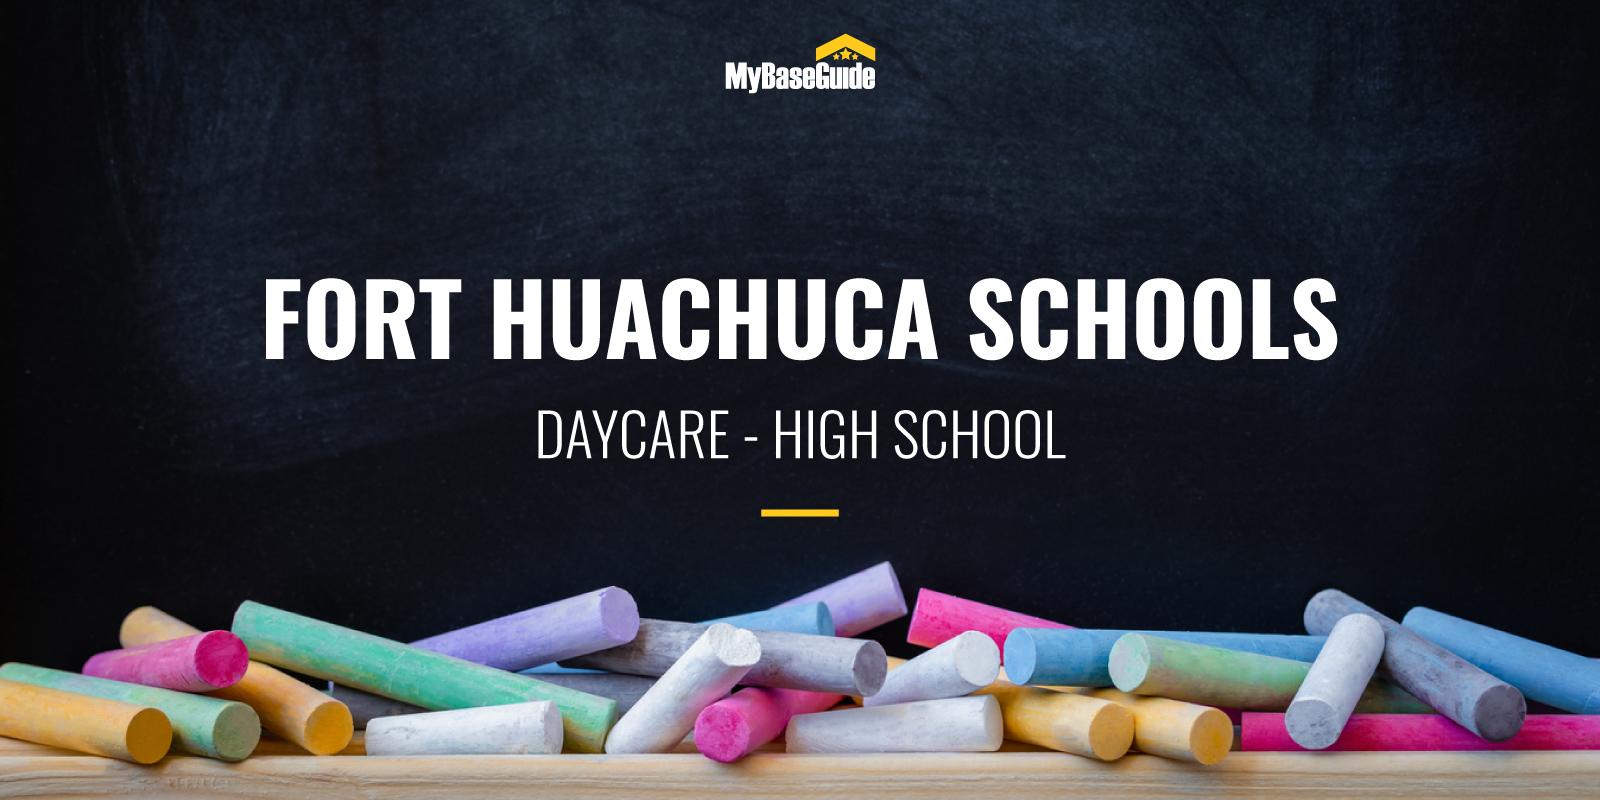 The Best Fort Huachuca Schools: Daycare - High School